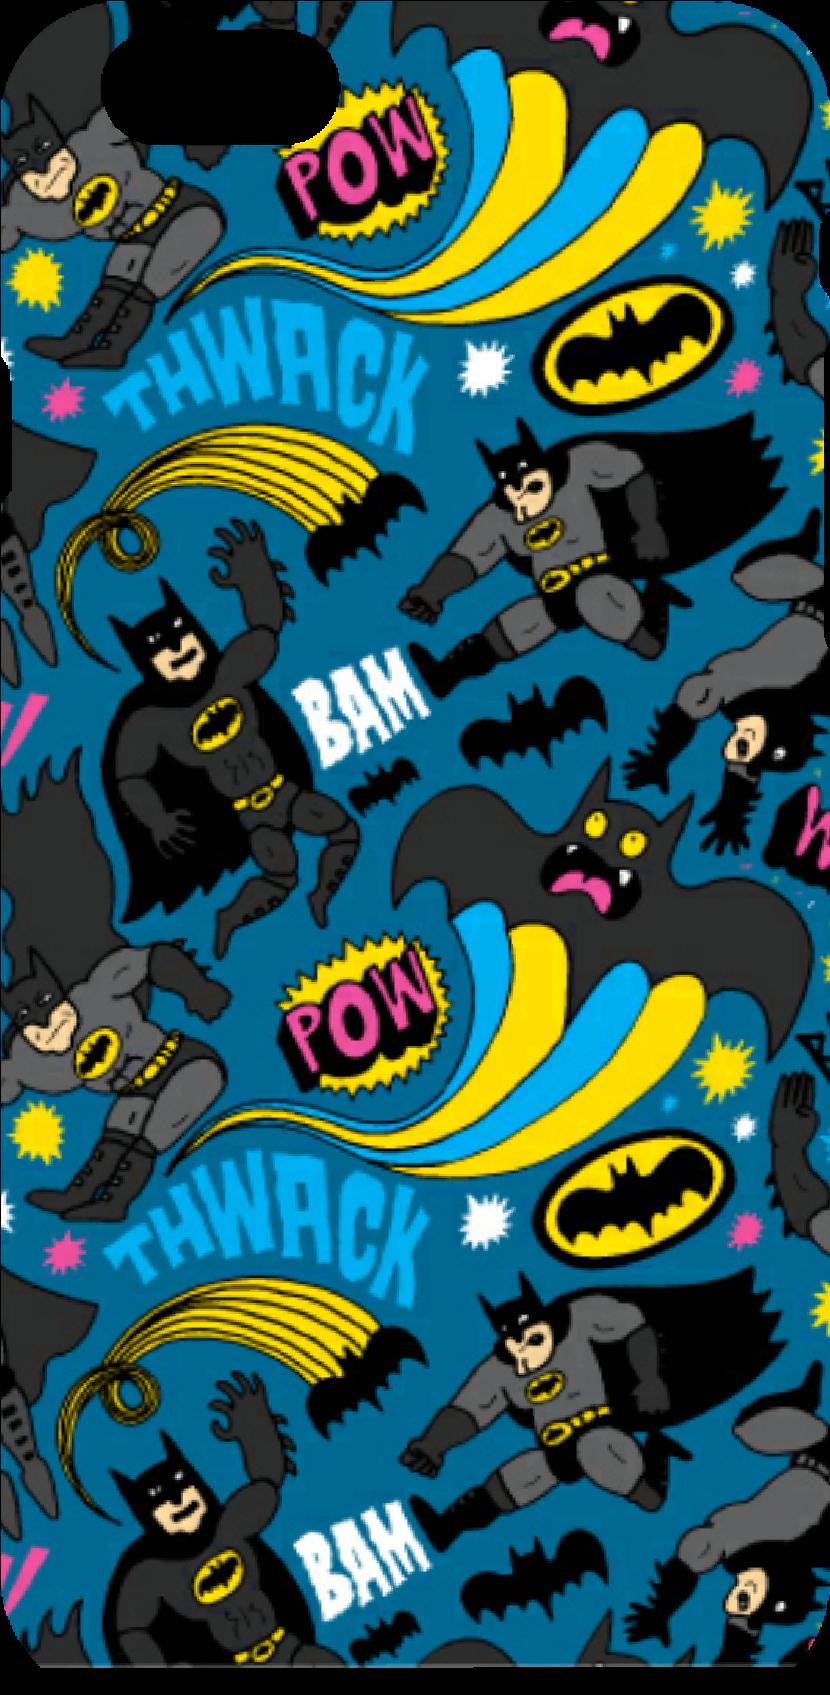 cover The batman